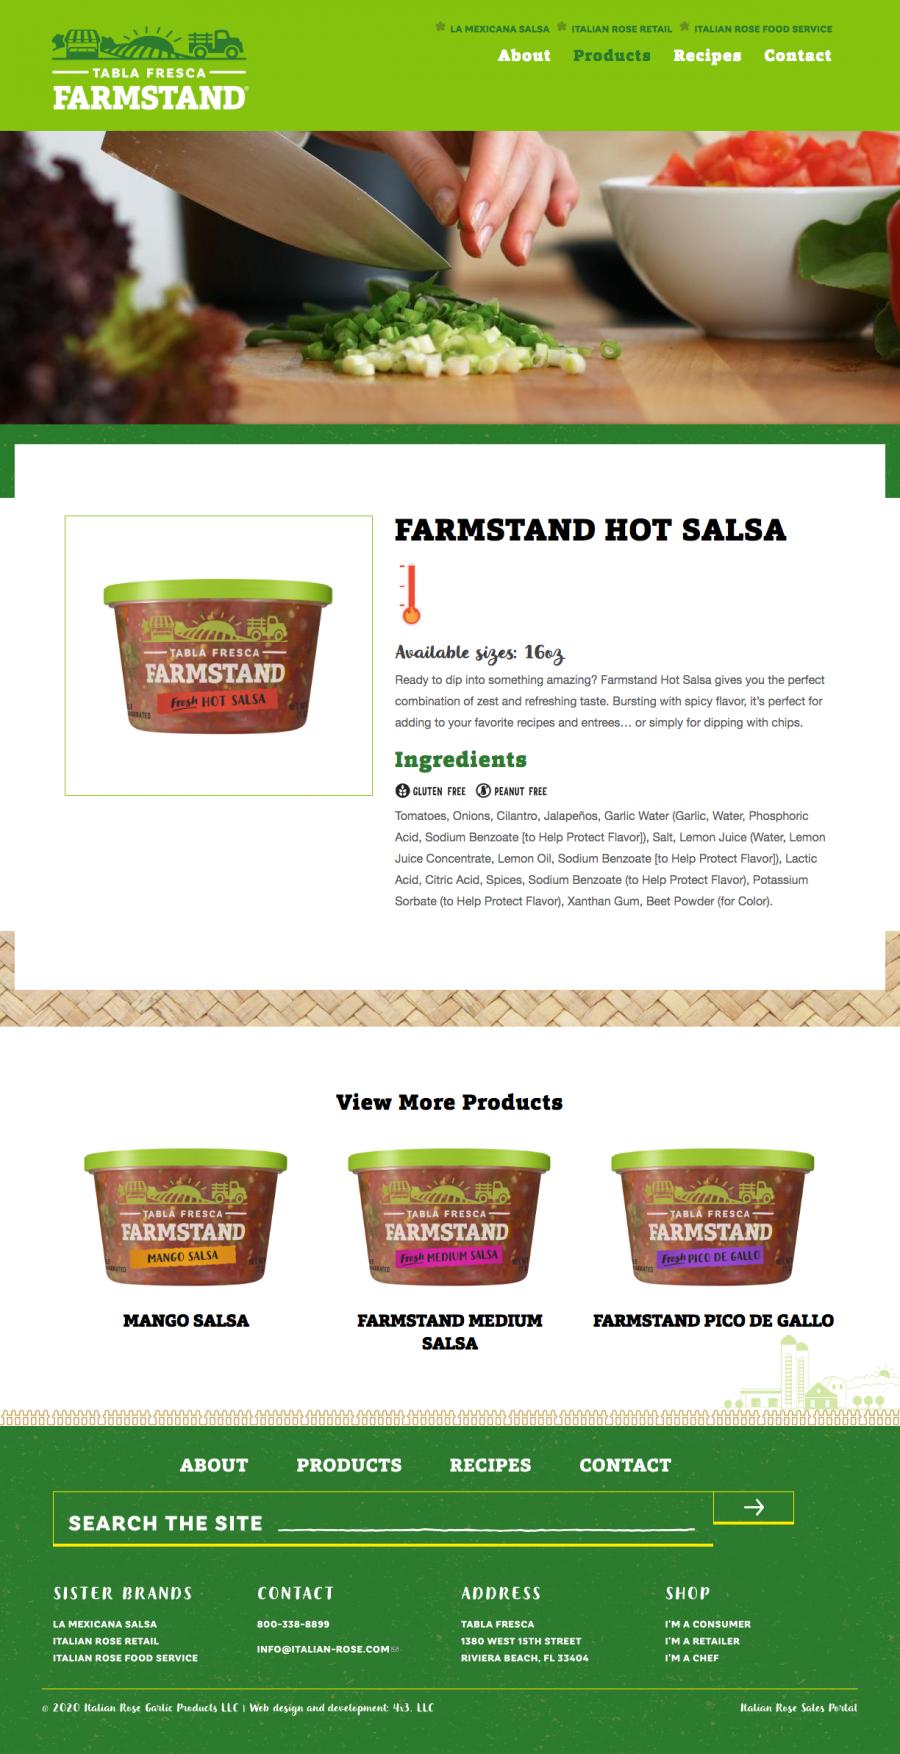 Tabla Fresca Farmstand product page